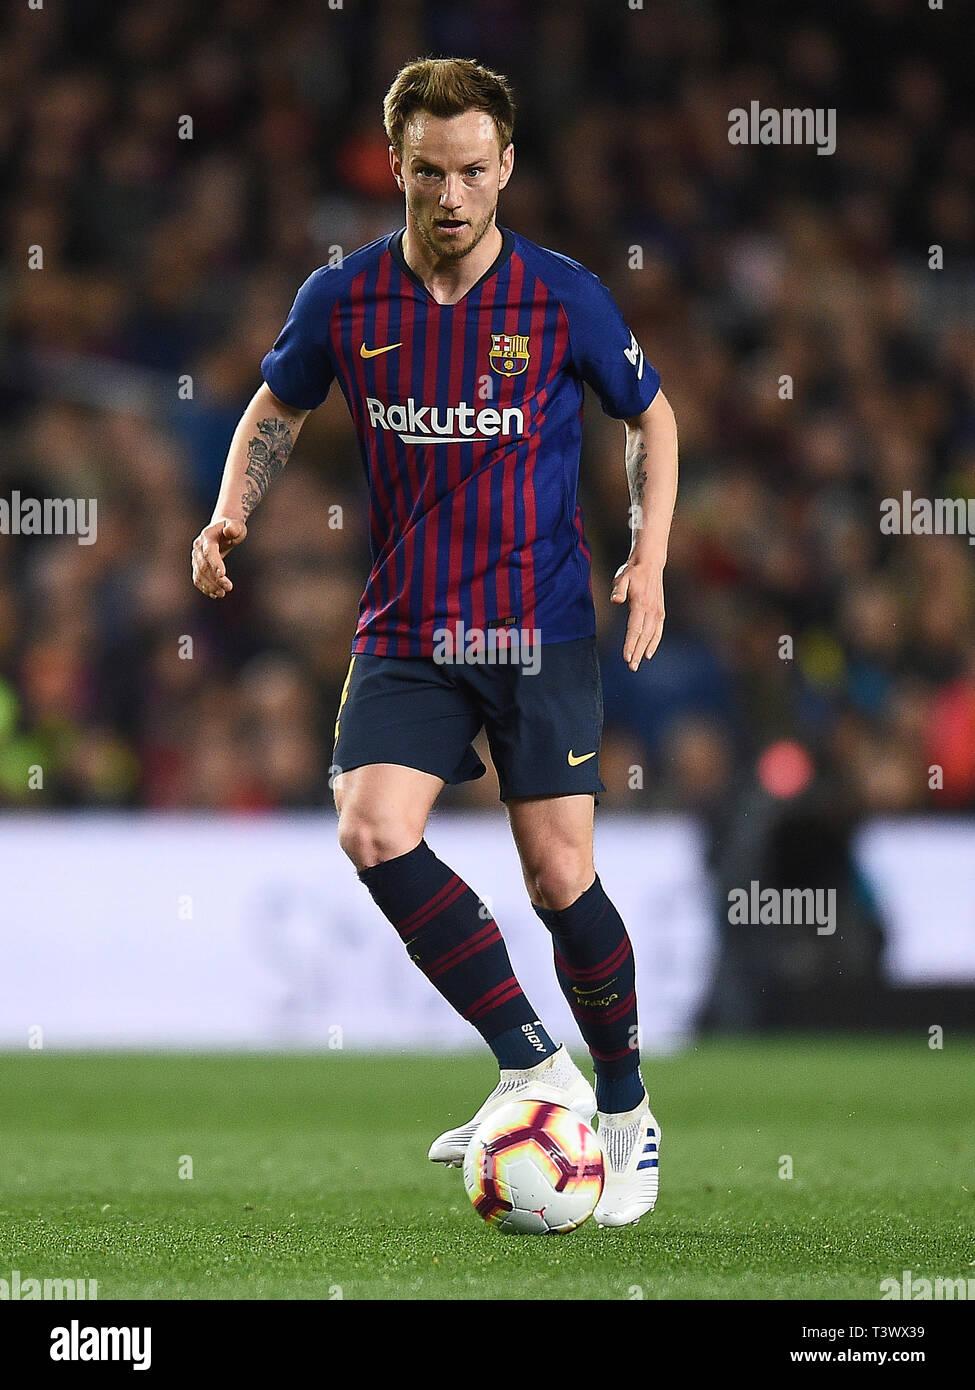 Ivan Rakitic des FC Barcelona während des Spiels zwischen dem FC Barcelona vs Atlético de Madrid von LaLiga, Datum 31, 2018-2019 Saison. Das Stadion Camp Nou. Barcelona, Spanien - 06. Apr 2019. Stockfoto